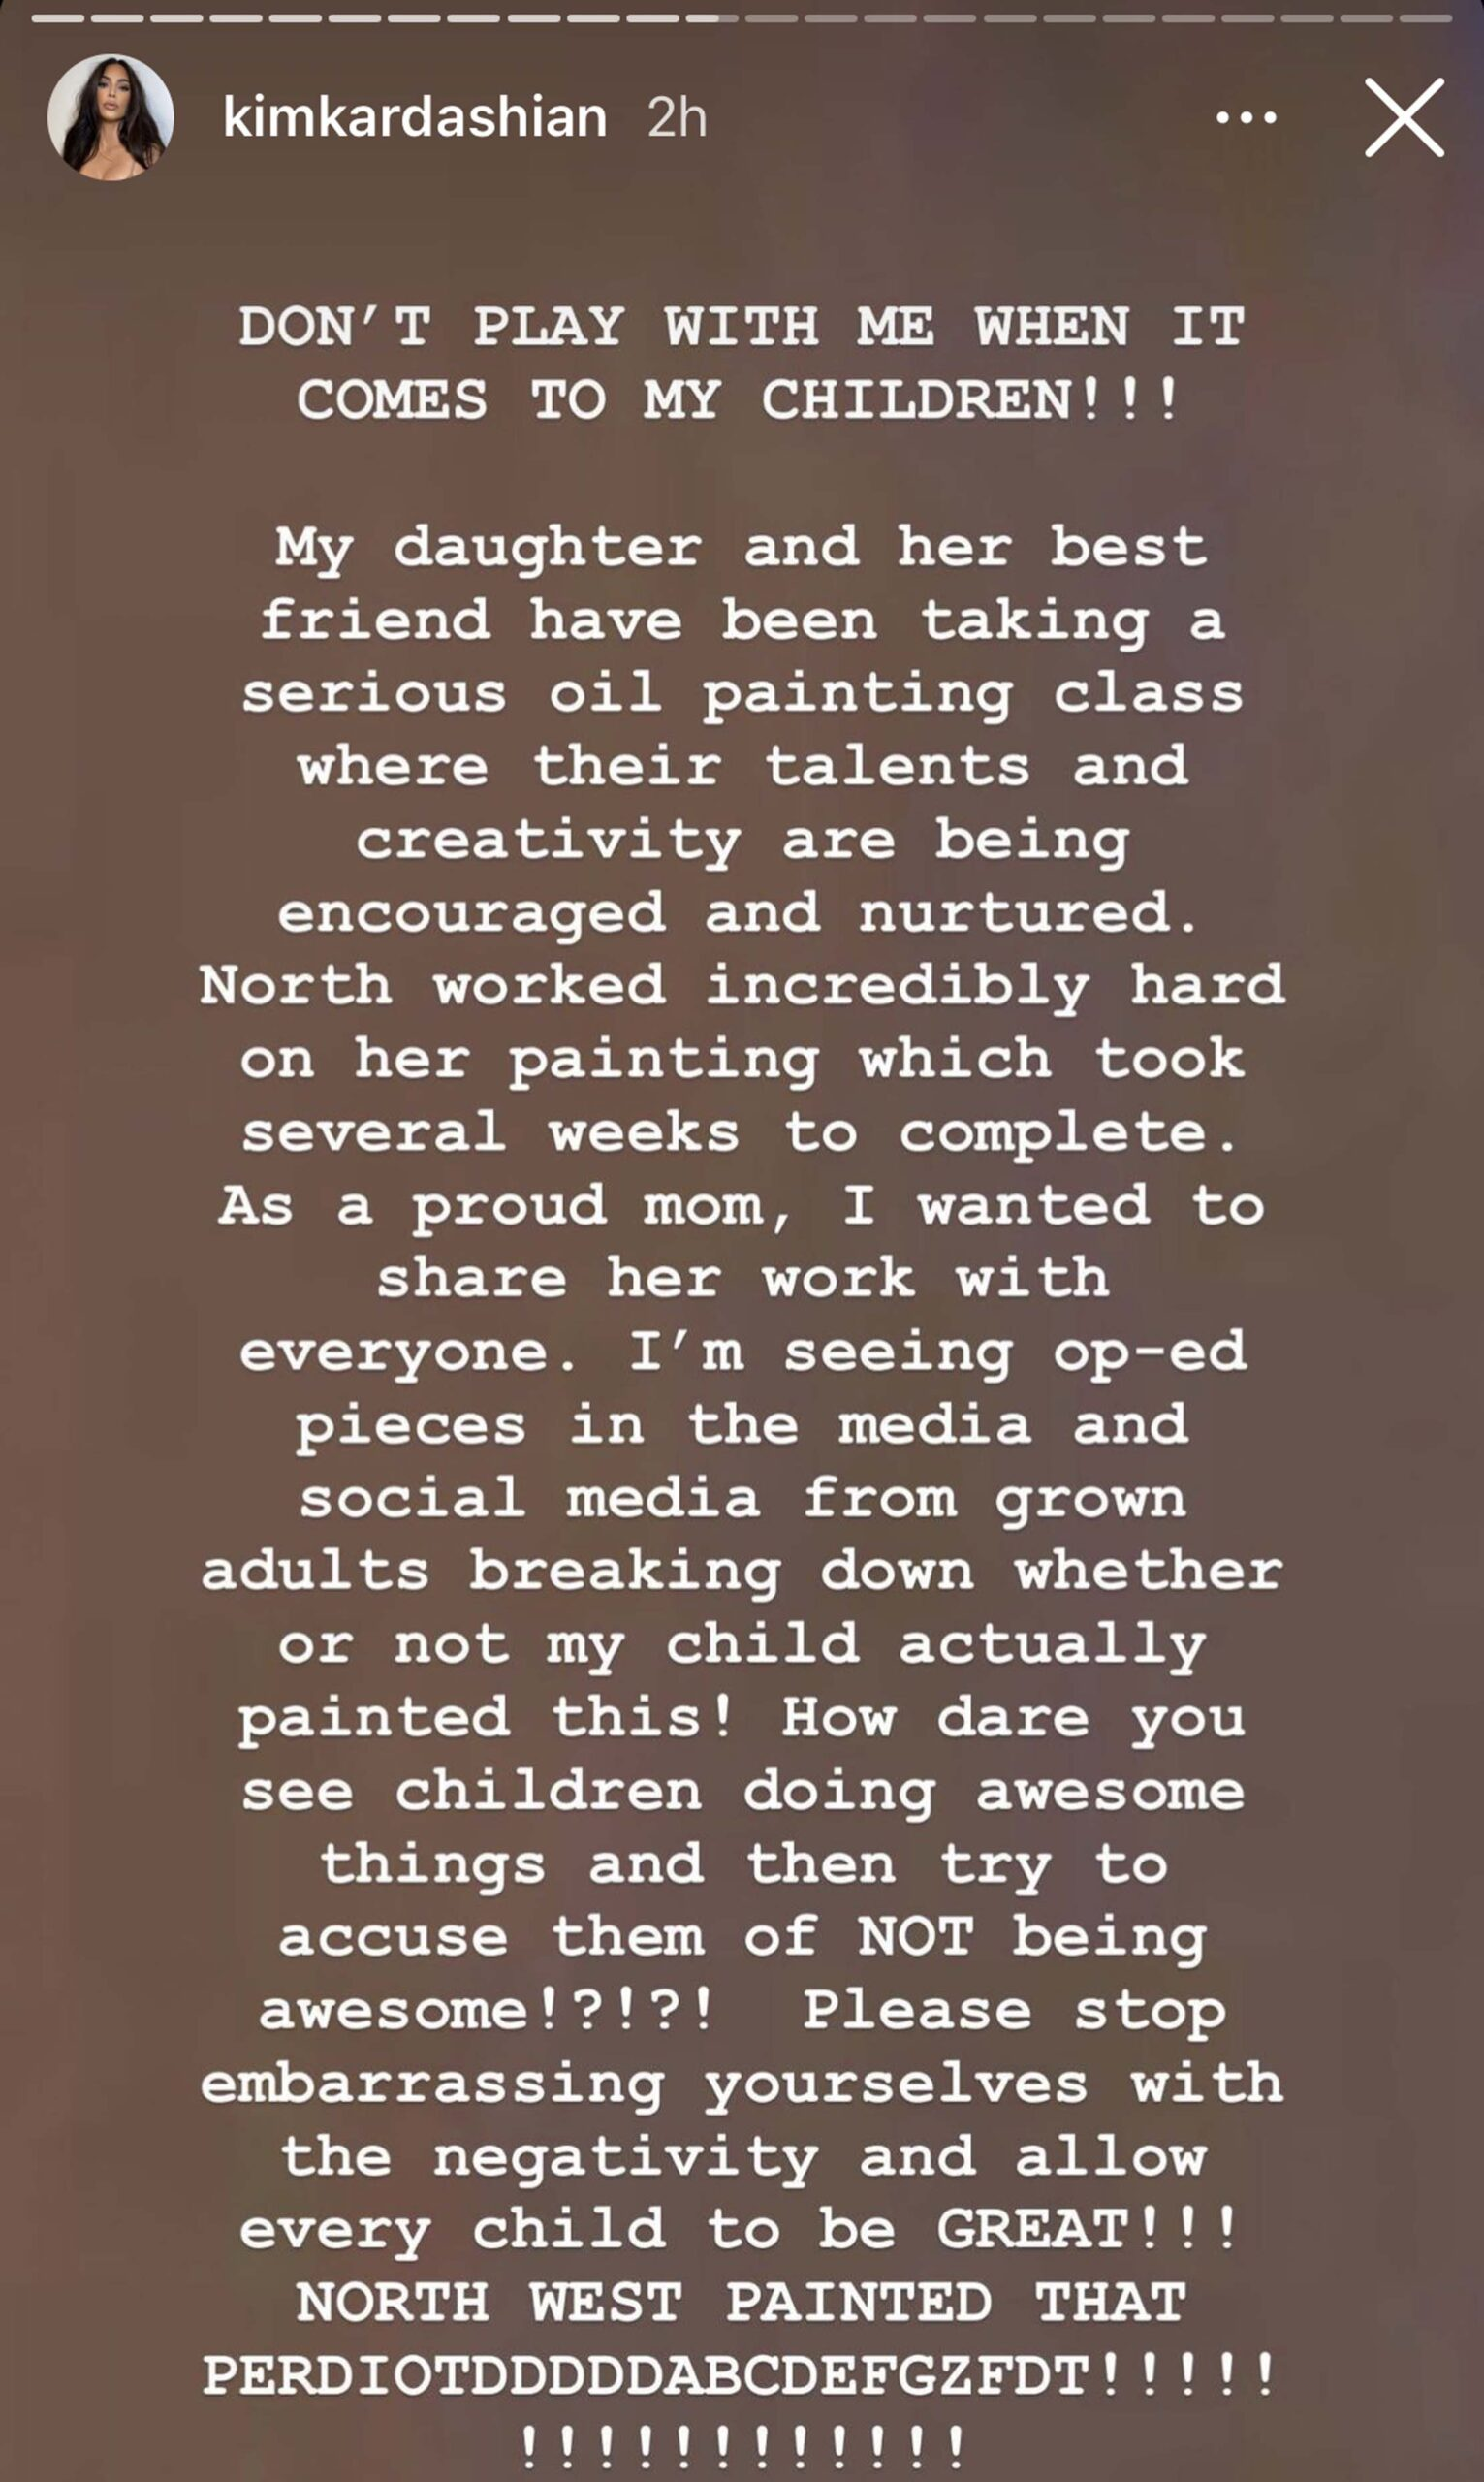 Kim står opp for North (Instagram/kimkardashian)